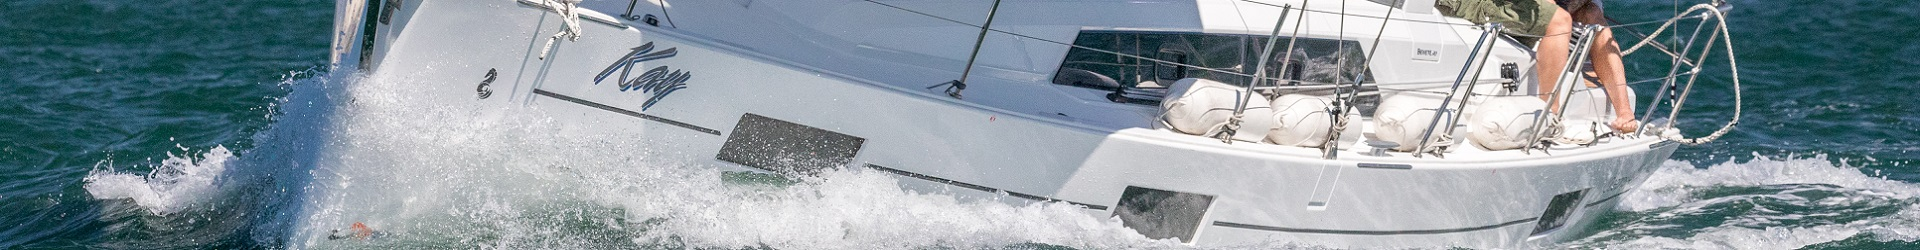 Asa Sailing Lessons In San Diego Harbor Sailboats